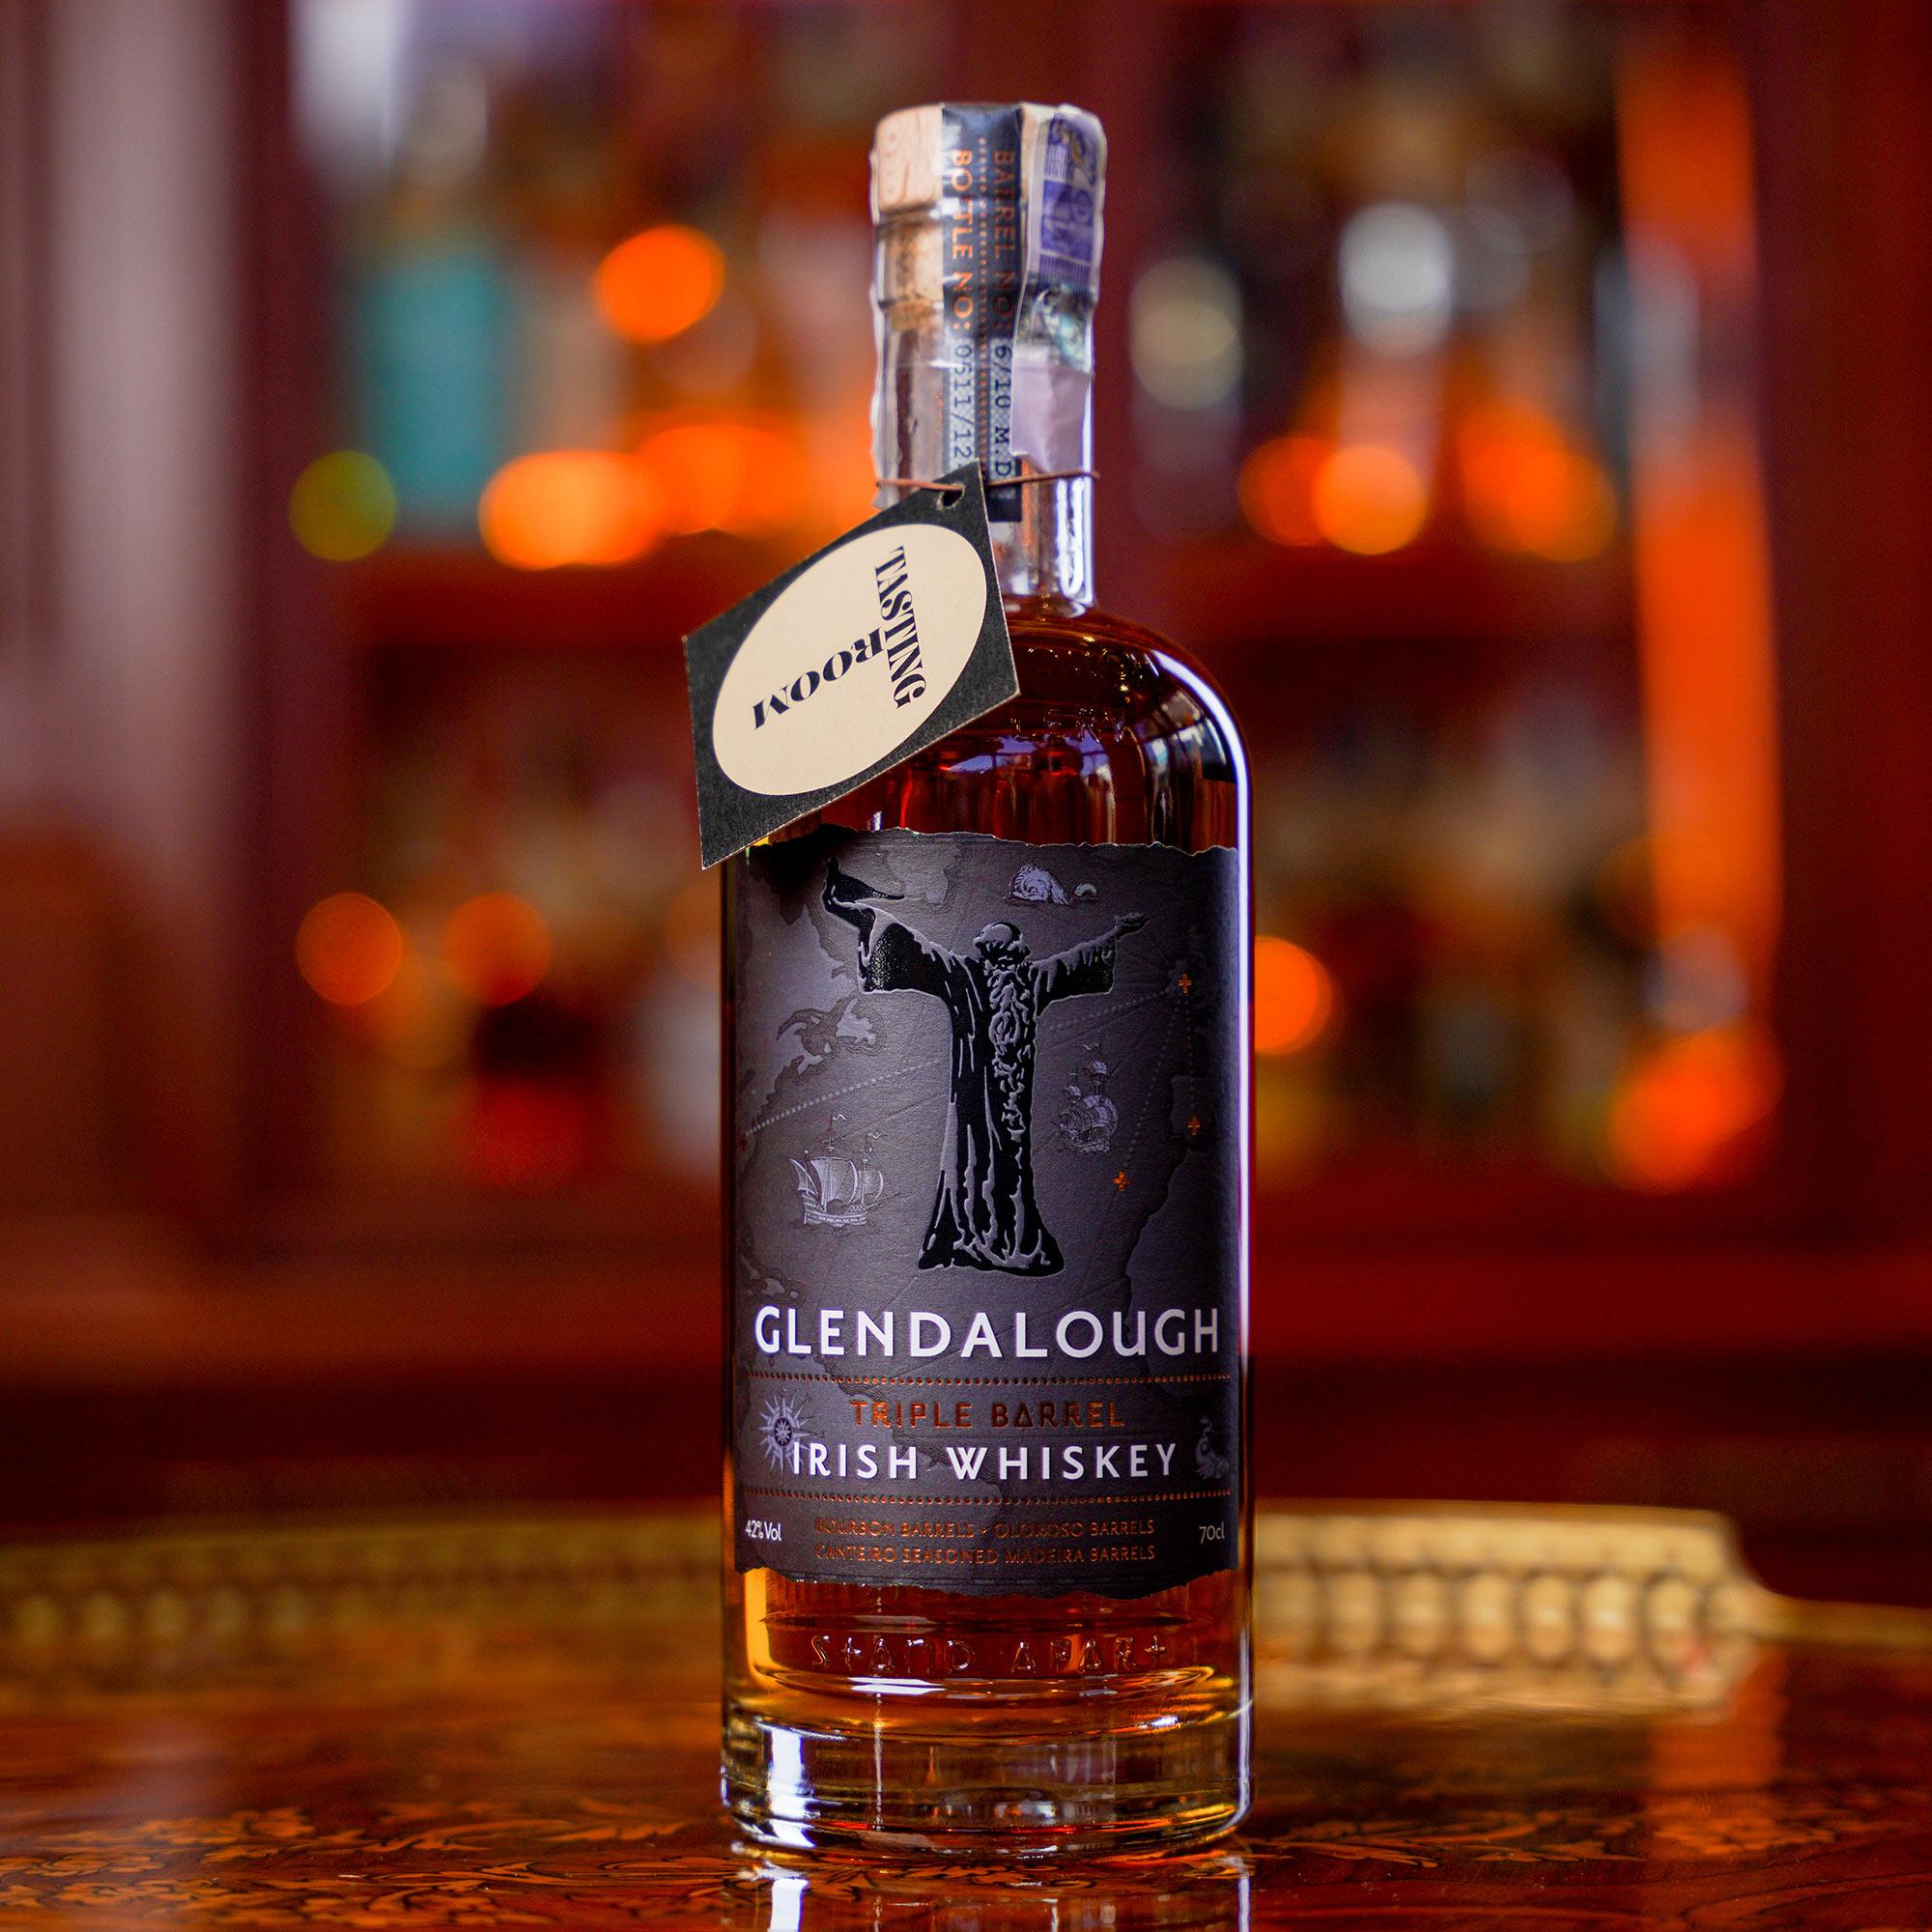 Glendalough Triple Barrel / Глендалок Трипъл Барел